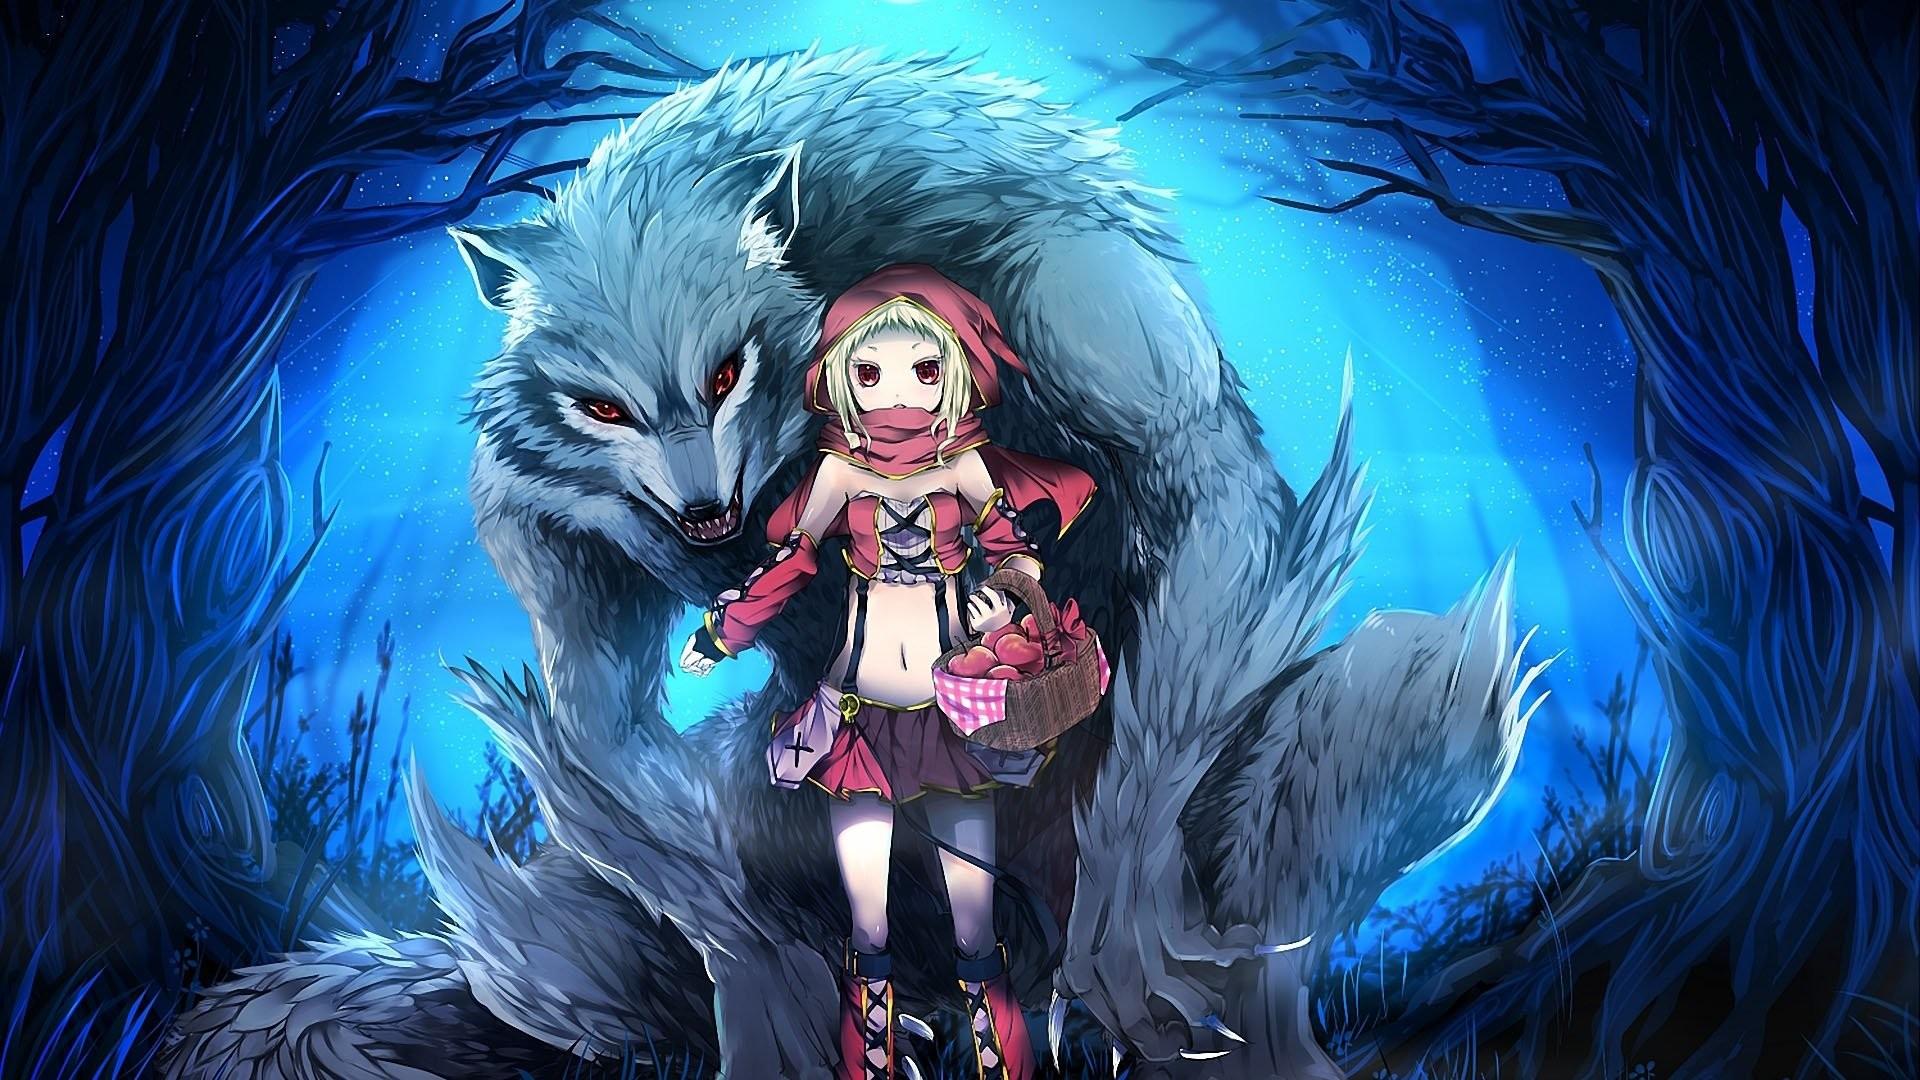 Red Riding Hood Anime Wallpaper » WallDevil – Best free HD desktop .